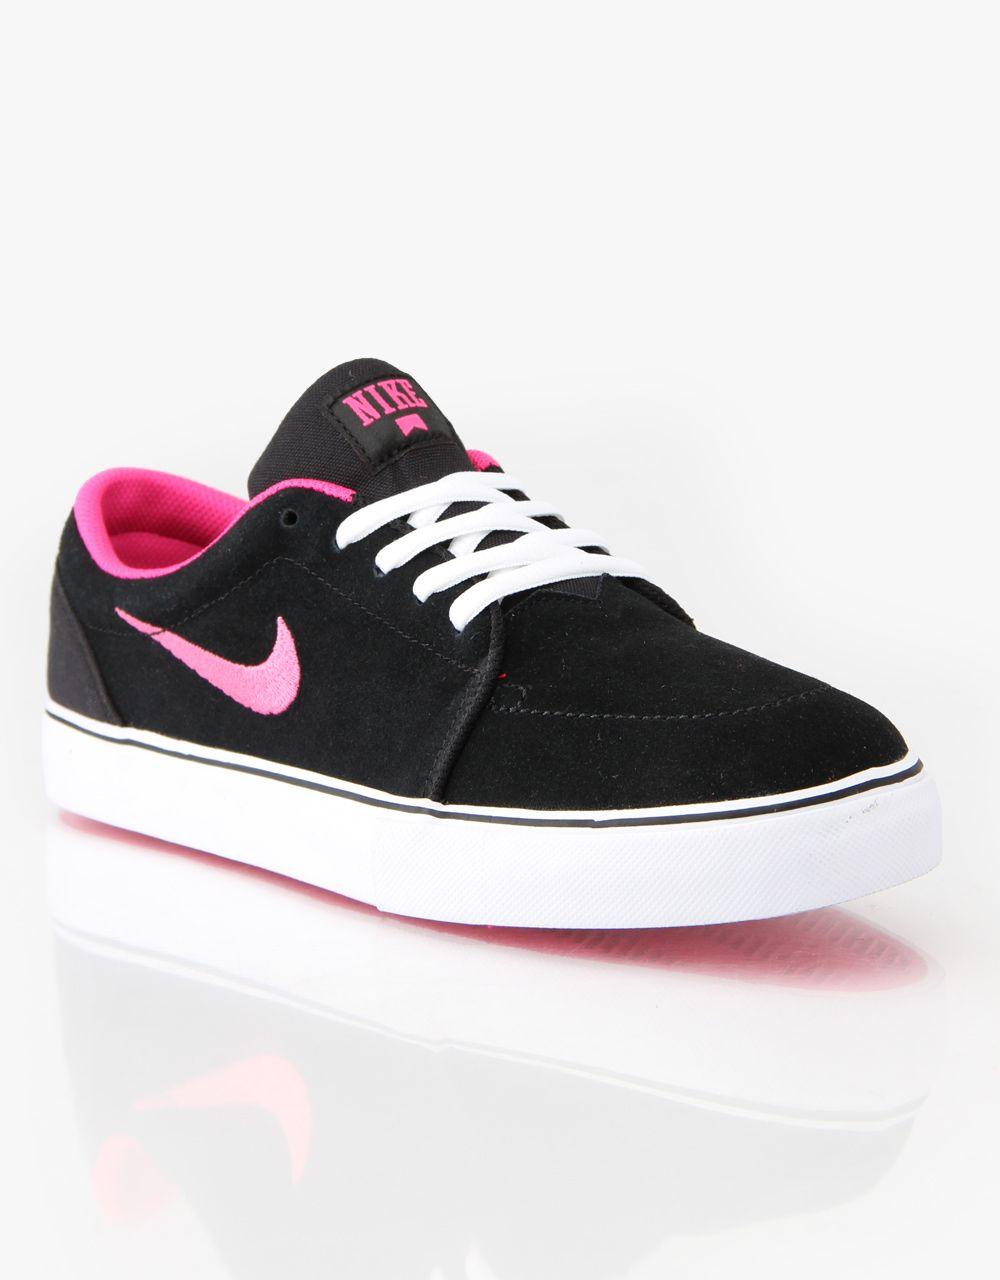 Nike SB satire black/ white/ pink